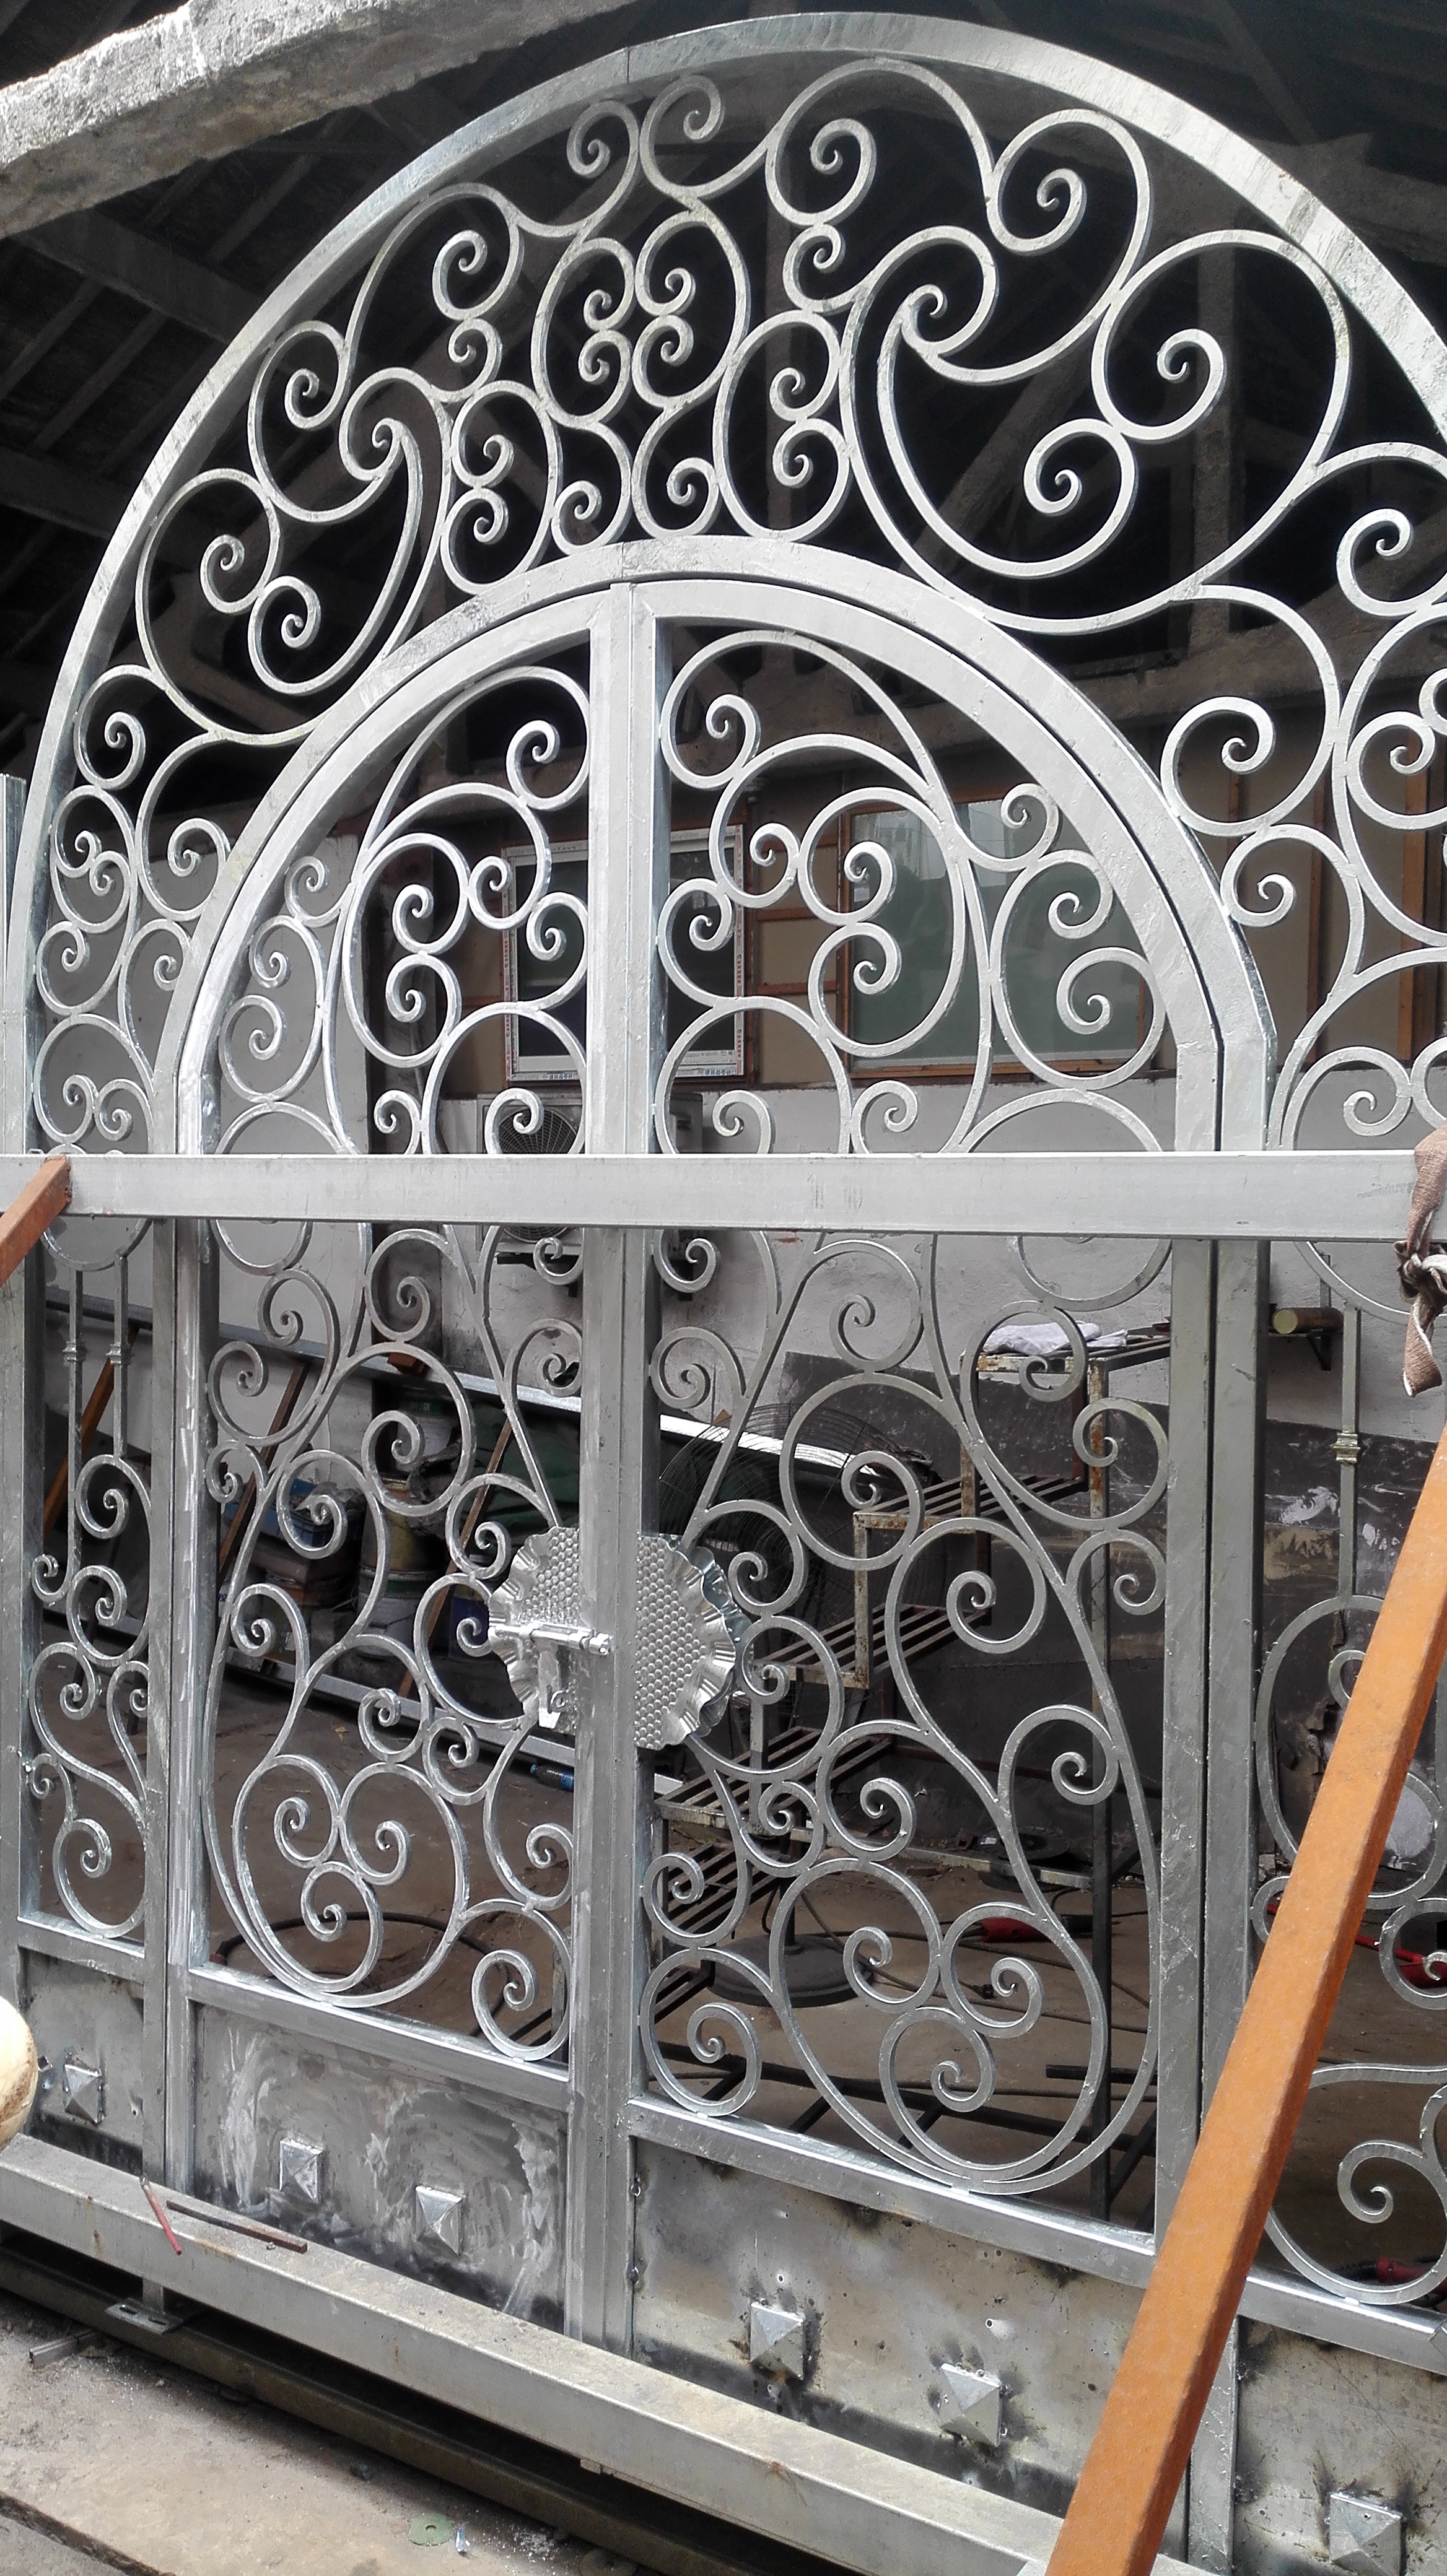 Shanghai Hench Brand China Factory 100% Custom Made Sale Australia Iron Works Security Doors